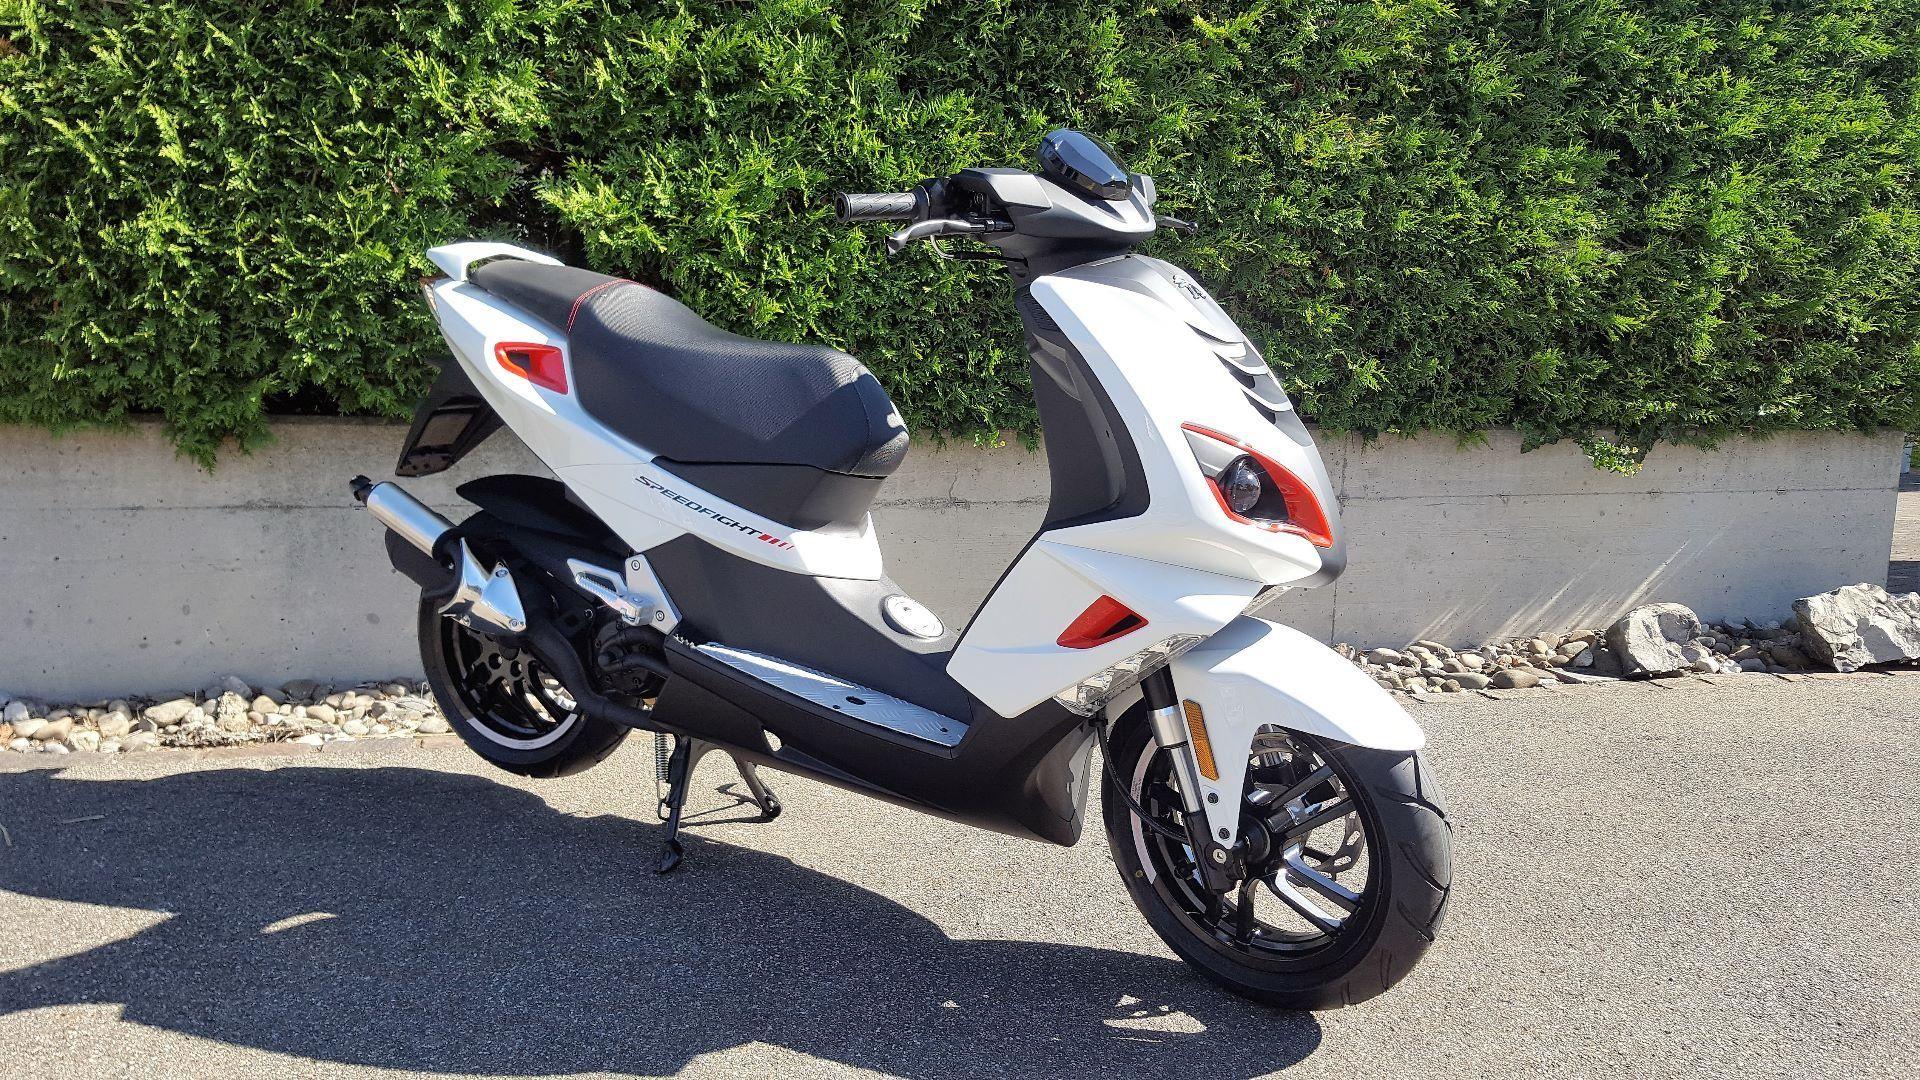 moto neuve acheter peugeot speedfight 4 50 il moto west waltenschwil. Black Bedroom Furniture Sets. Home Design Ideas